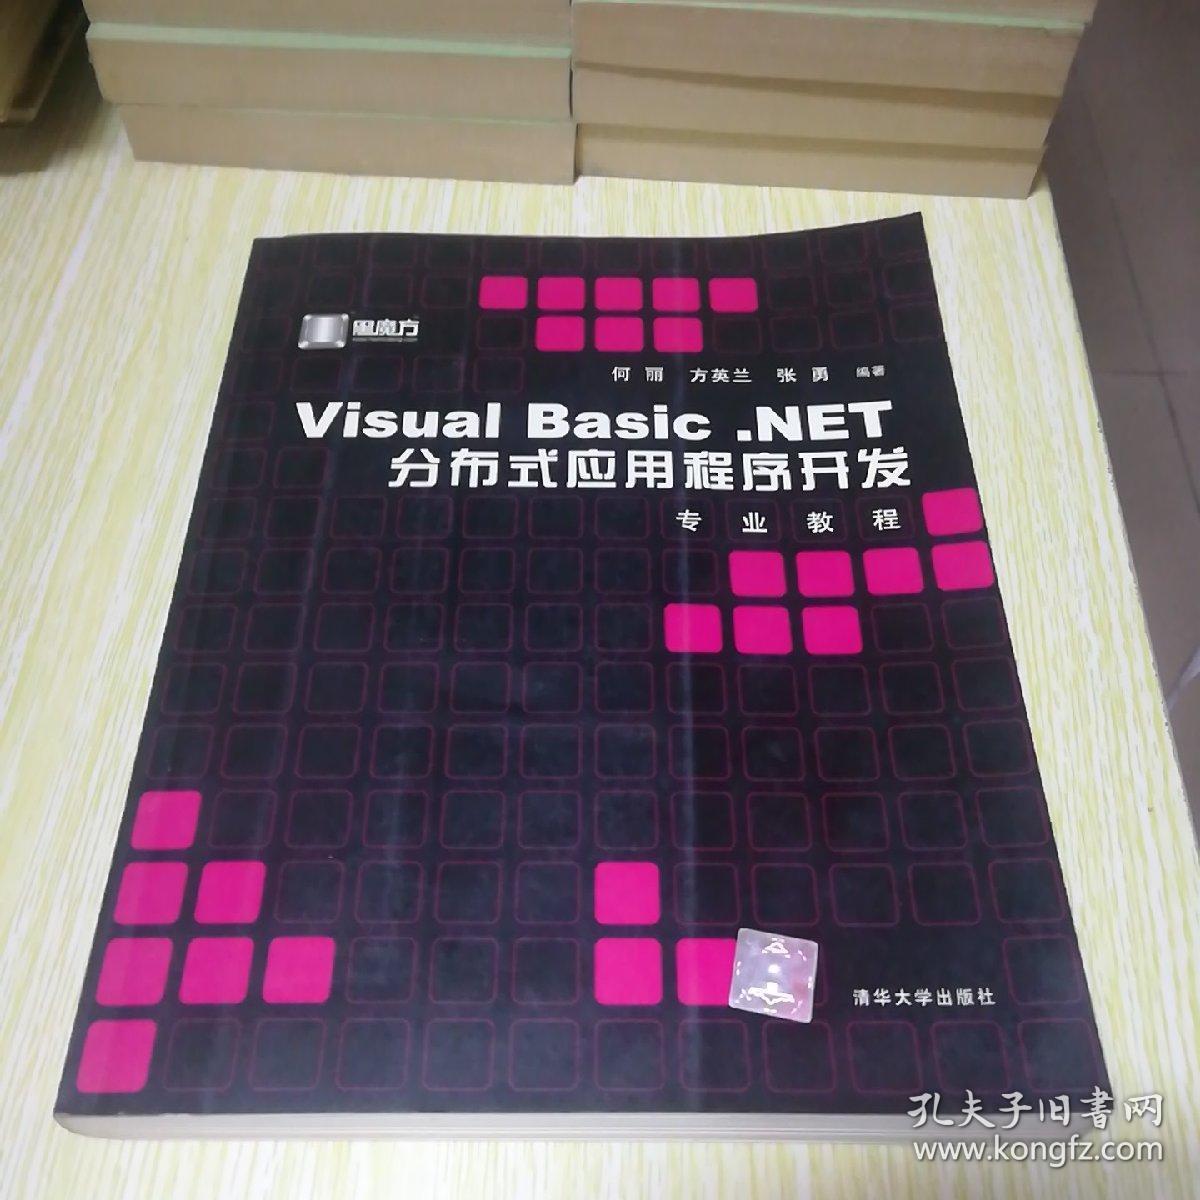 Visual Basic.NET分布式应用程序开发专业教程